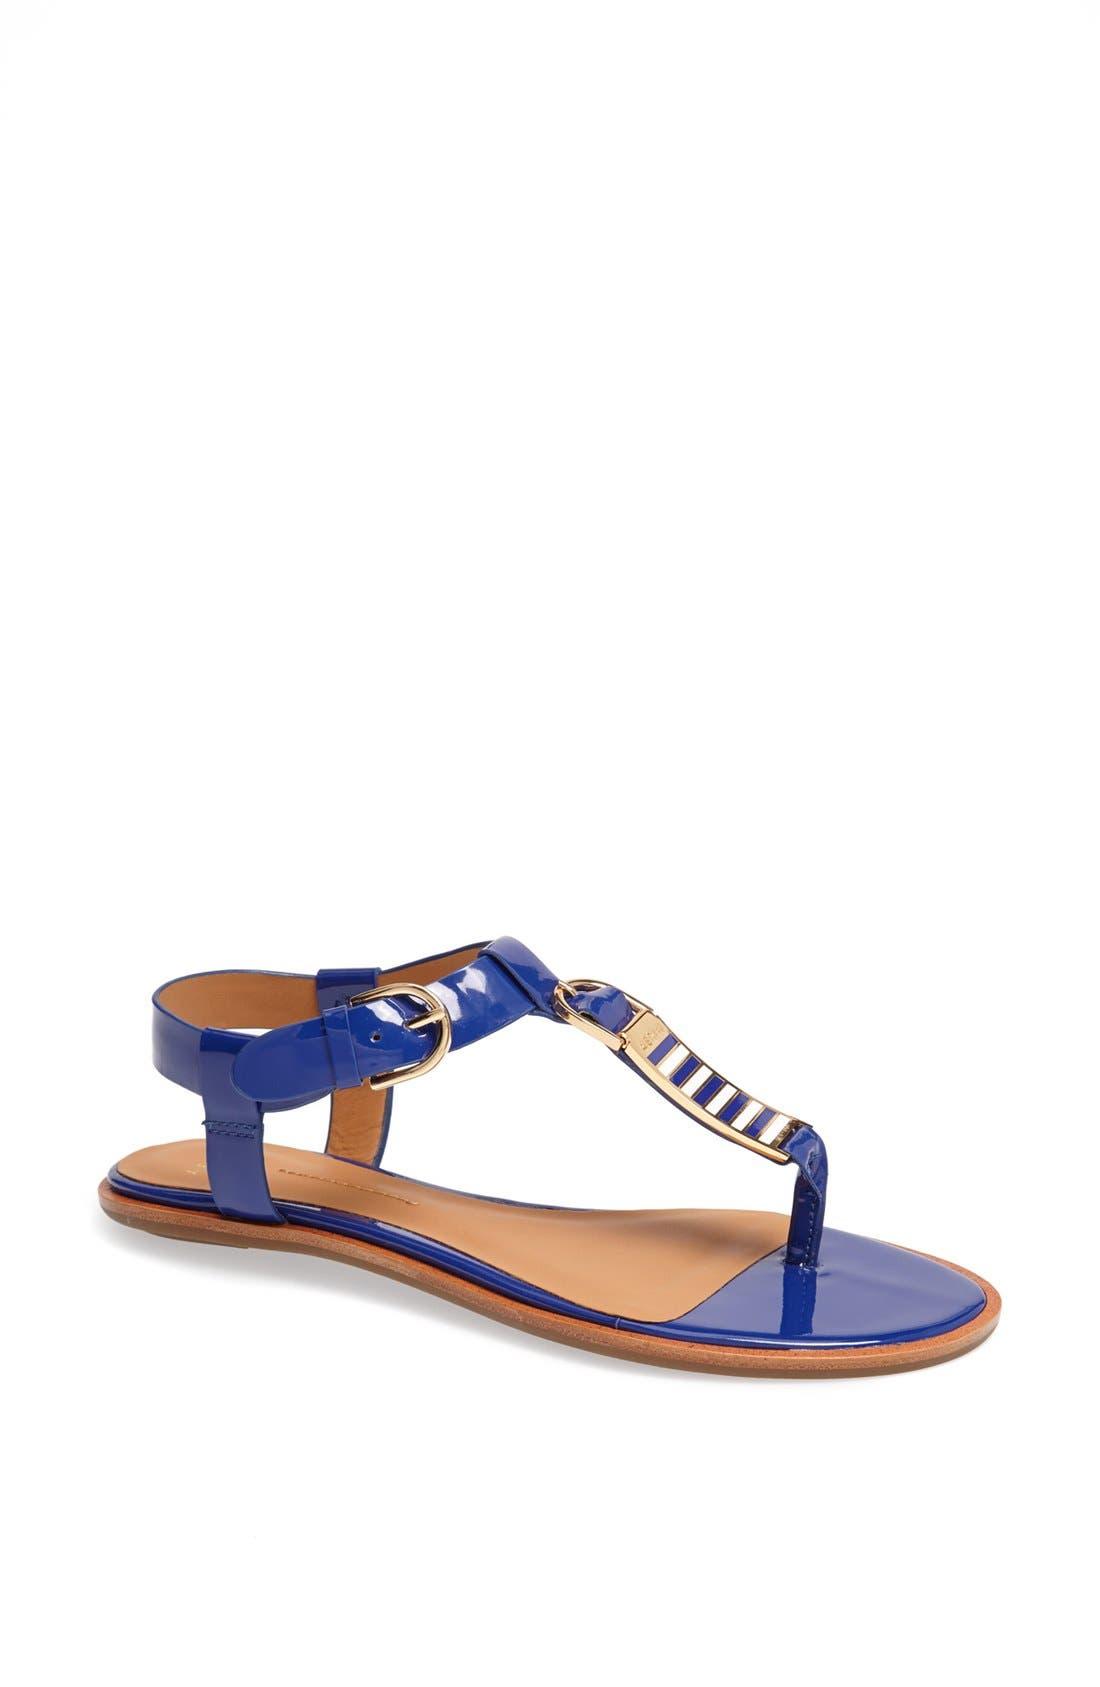 Main Image - Aerin 'Swift' Sandal